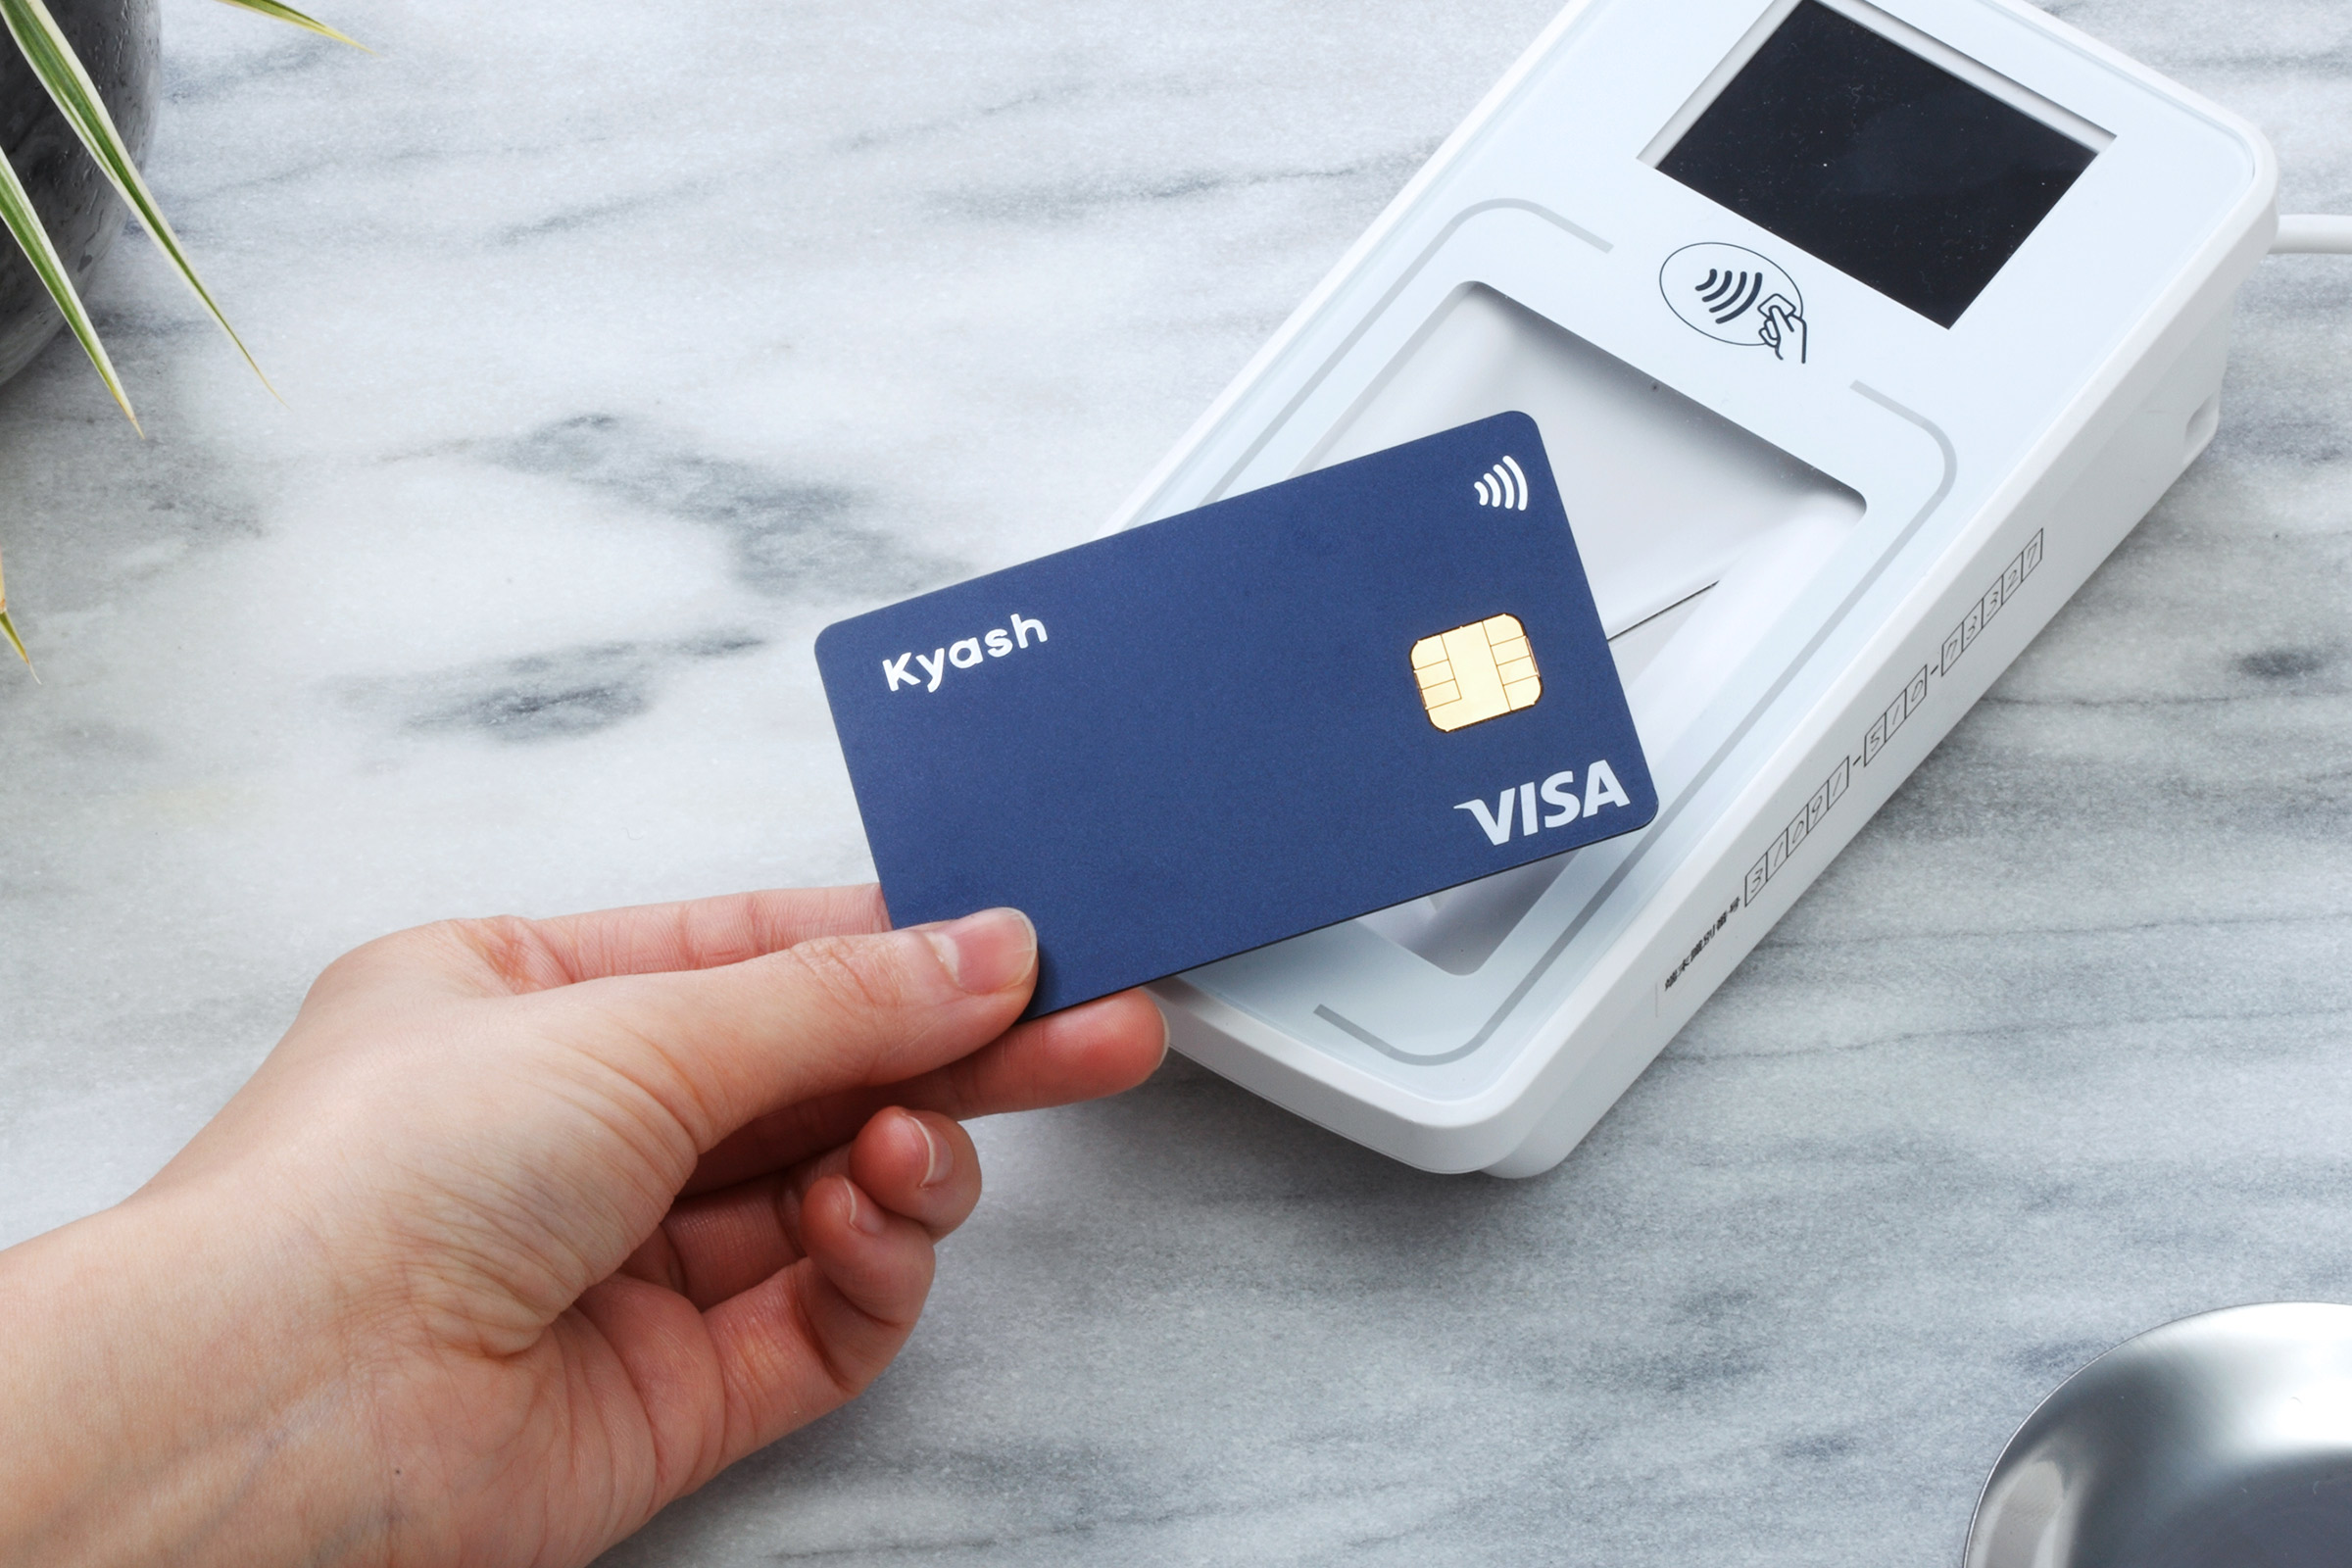 Kyash CardをかざしVisaのタッチ決済